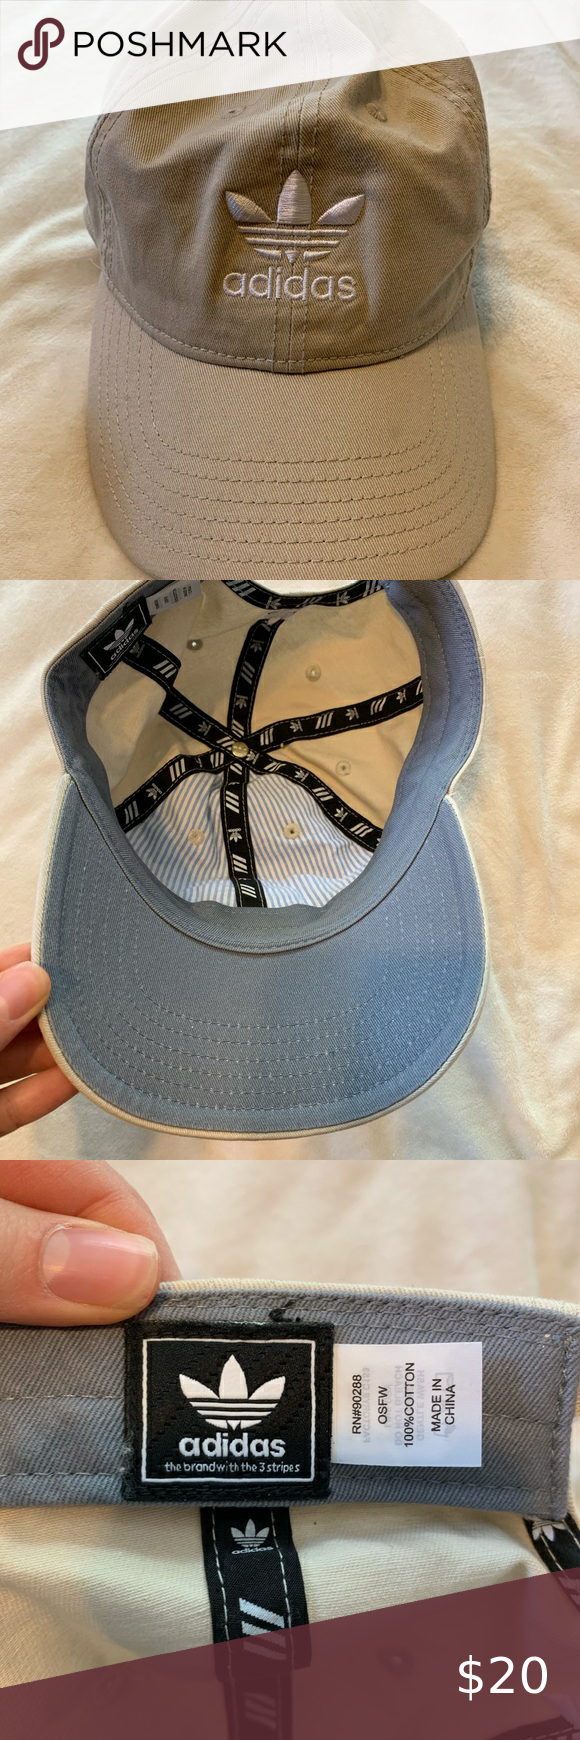 Adidas Khaki Baseball Cap Beige Hat Adidas Khaki